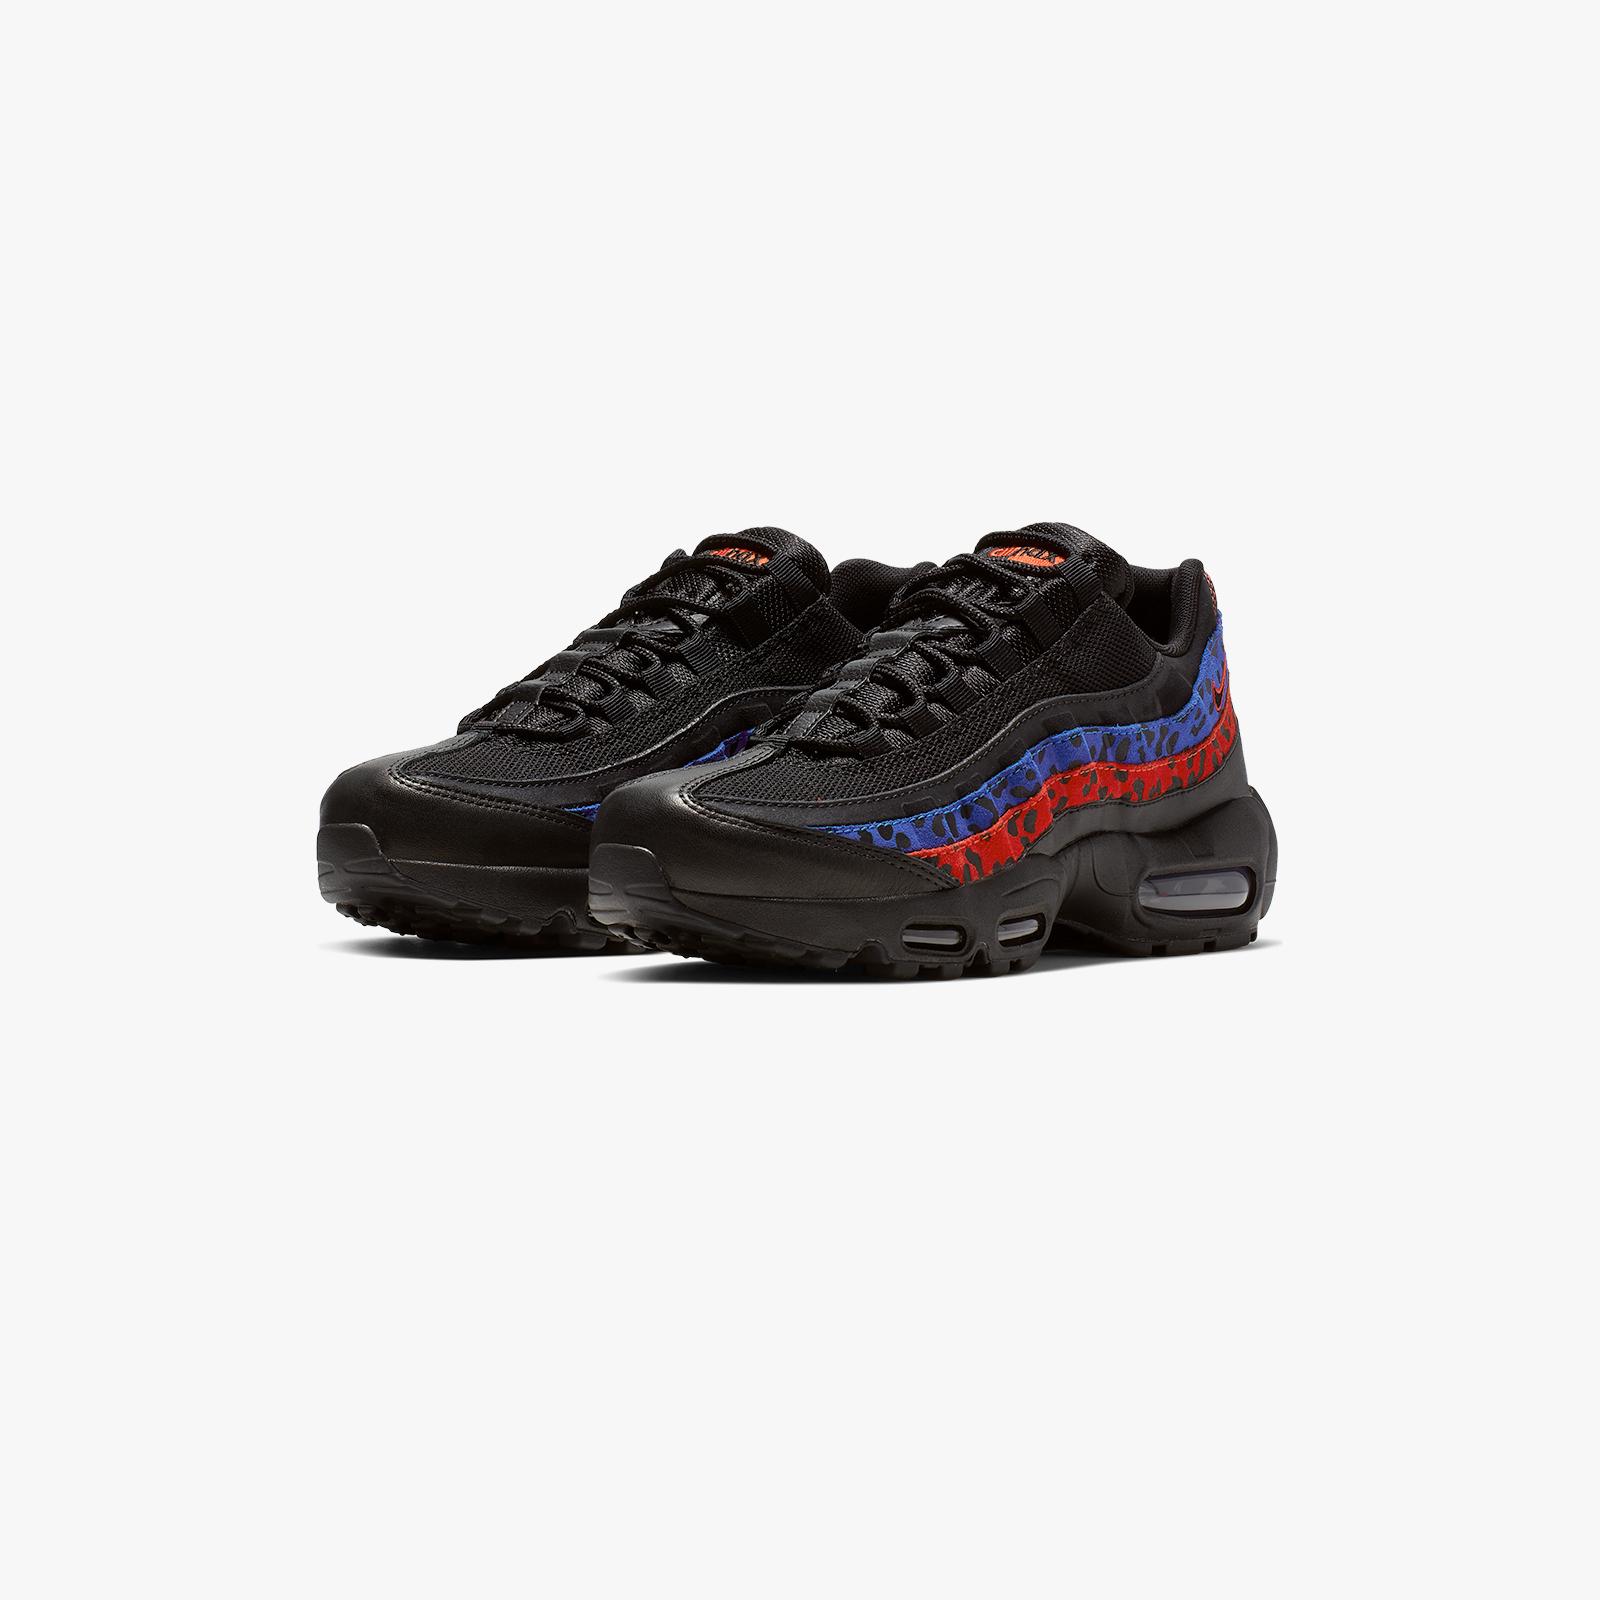 fd597e4950 Nike Wmns Air Max 95 Premium - Cd0180-001 - Sneakersnstuff   sneakers &  streetwear online since 1999